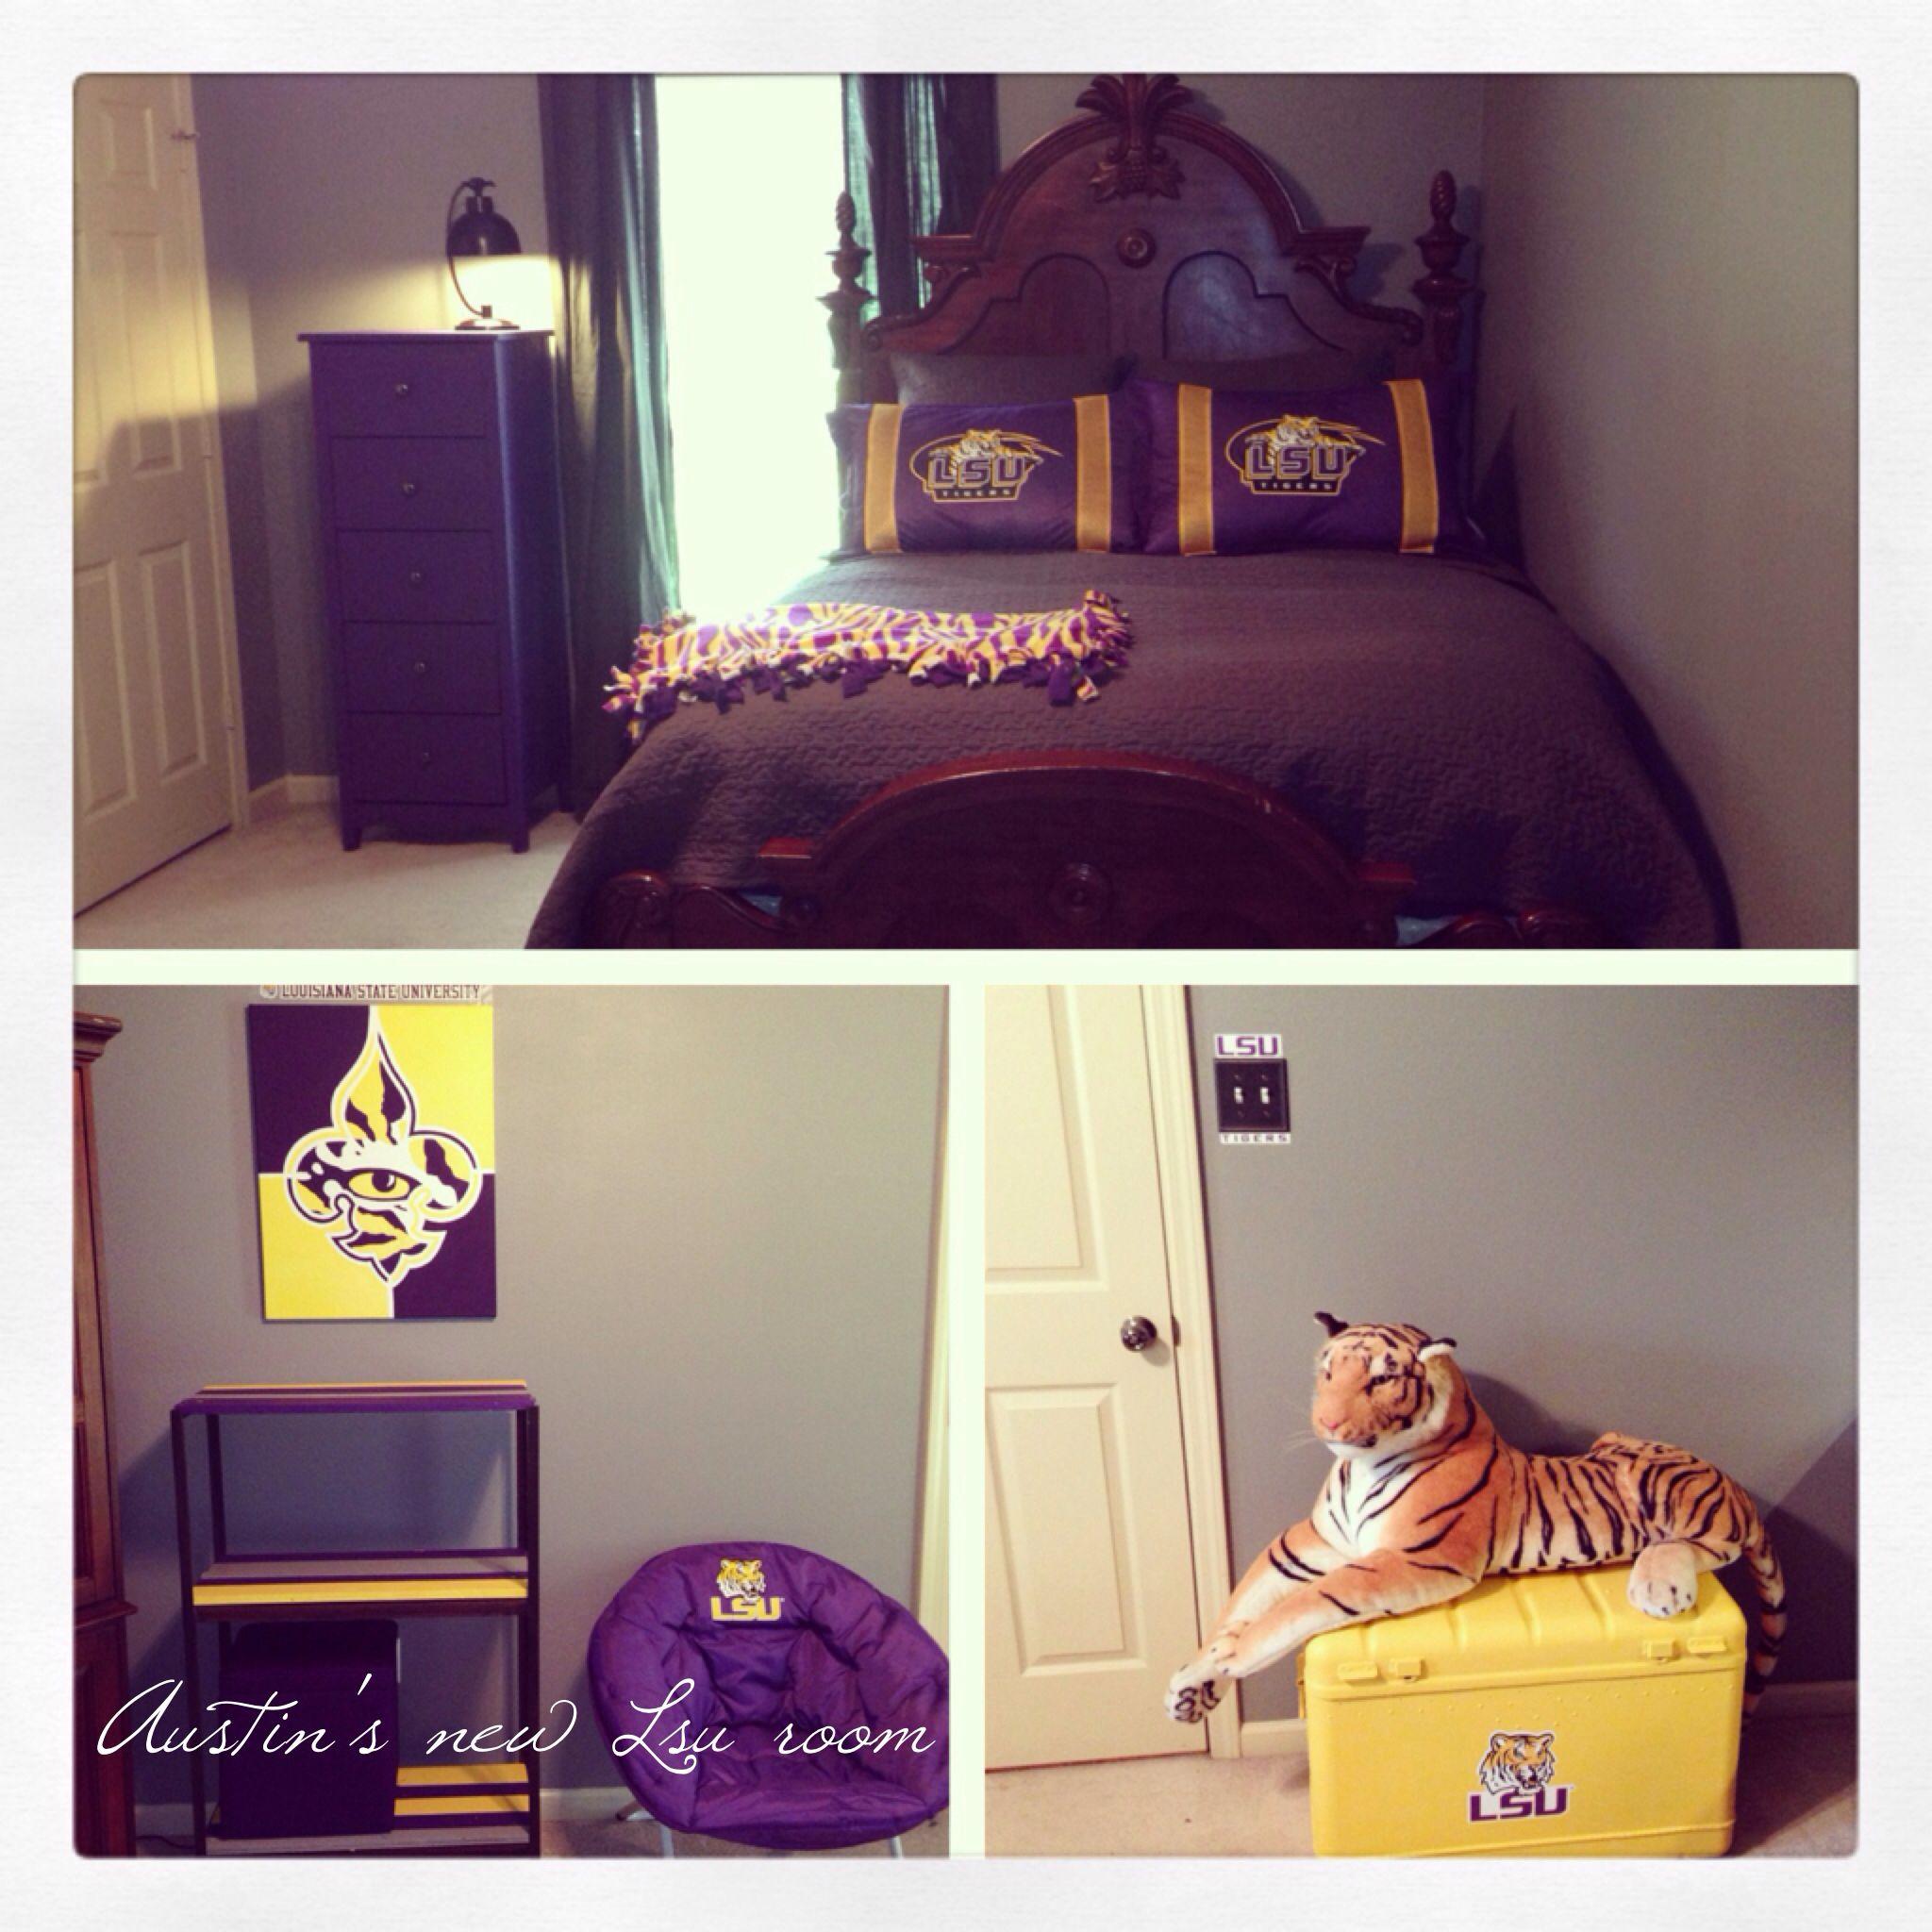 Lsu Room For Boys Done Right Lsu Mancave Pinterest Room Jpg 2048x2048 Lsu  Bedroom